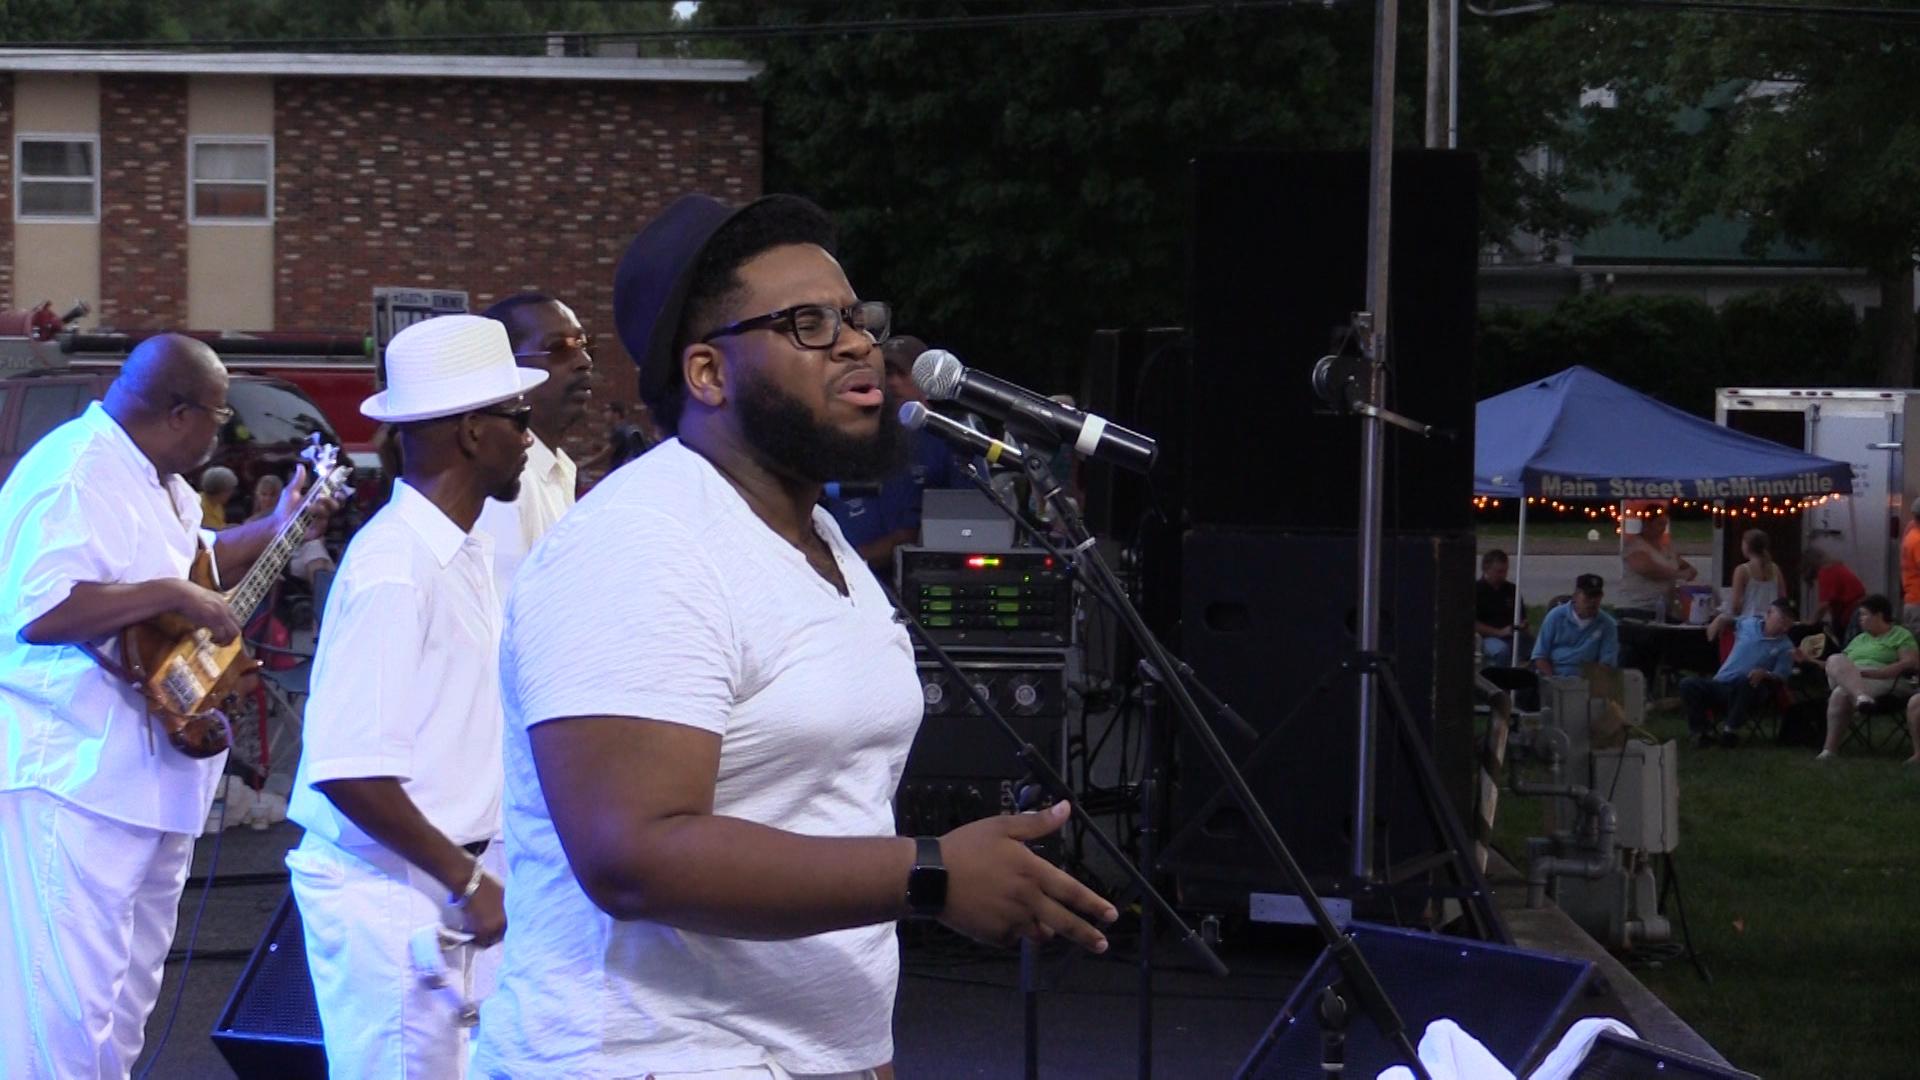 VIDEO: Utopia plays Main Street LIVE!